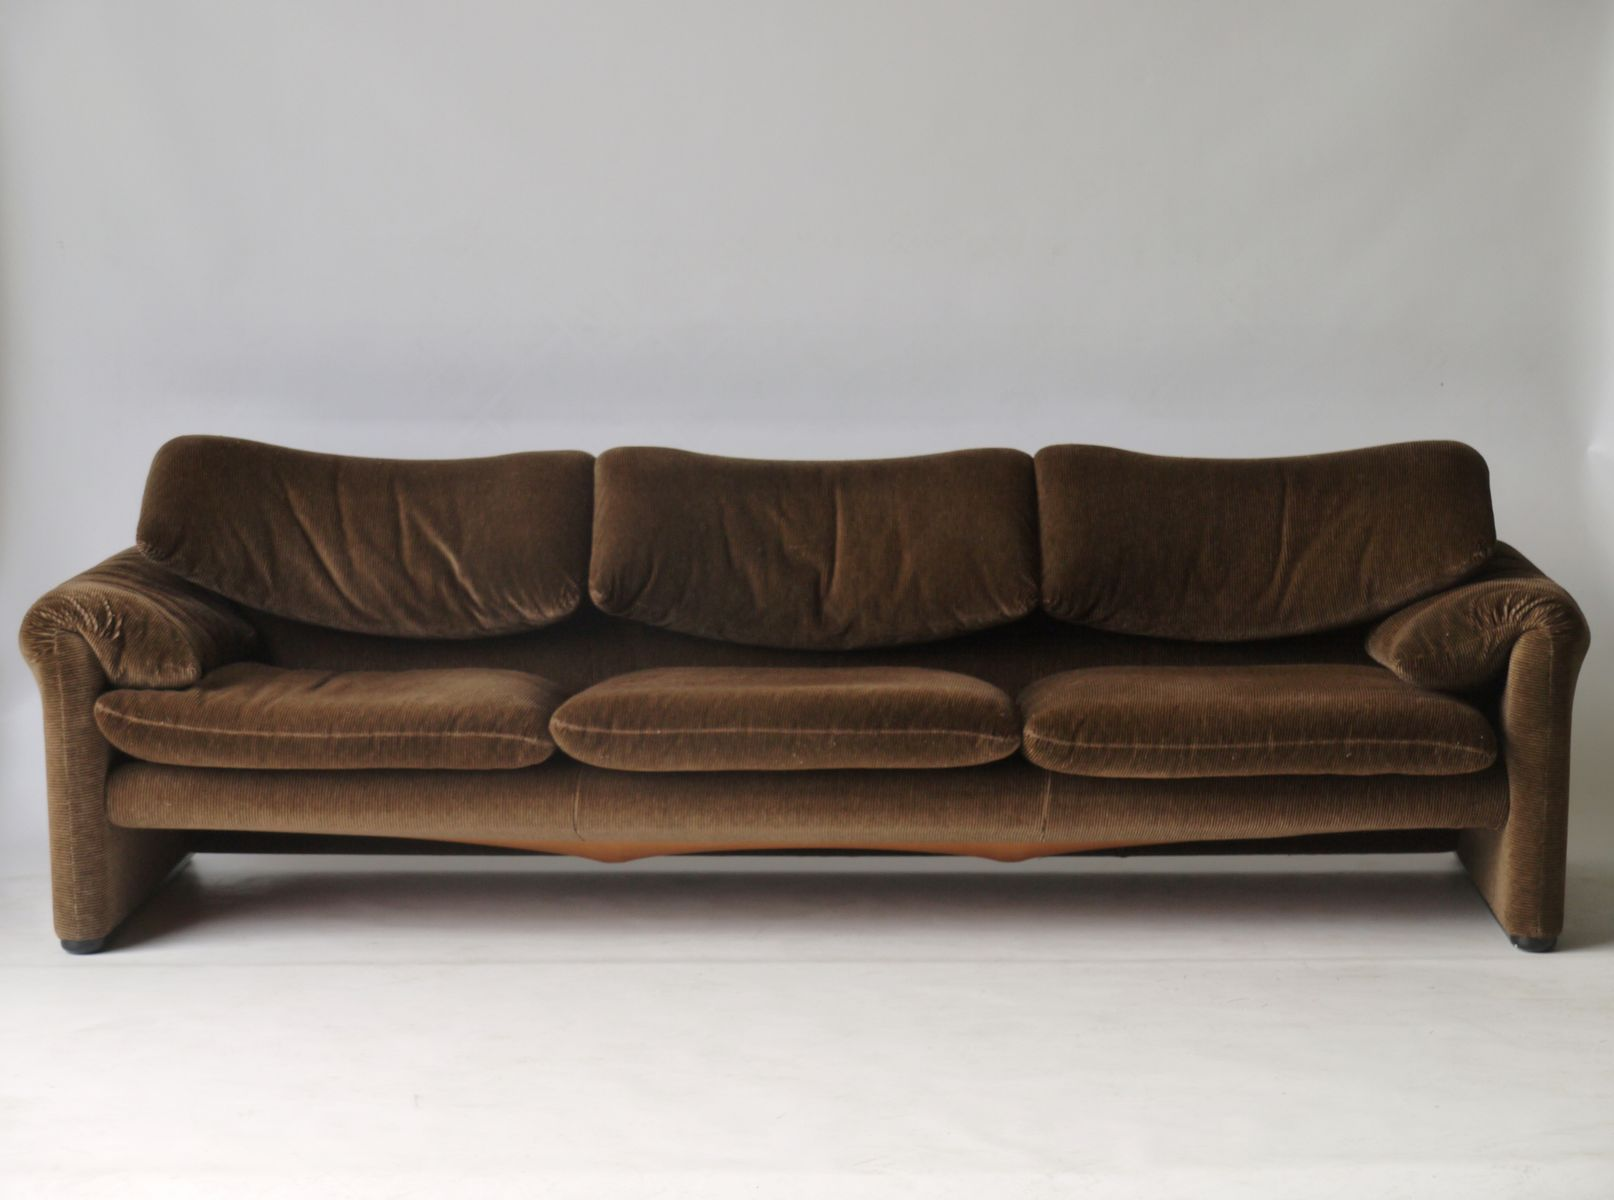 Maralunga Sofa By Vico Magistretti For Cassina 1970s For